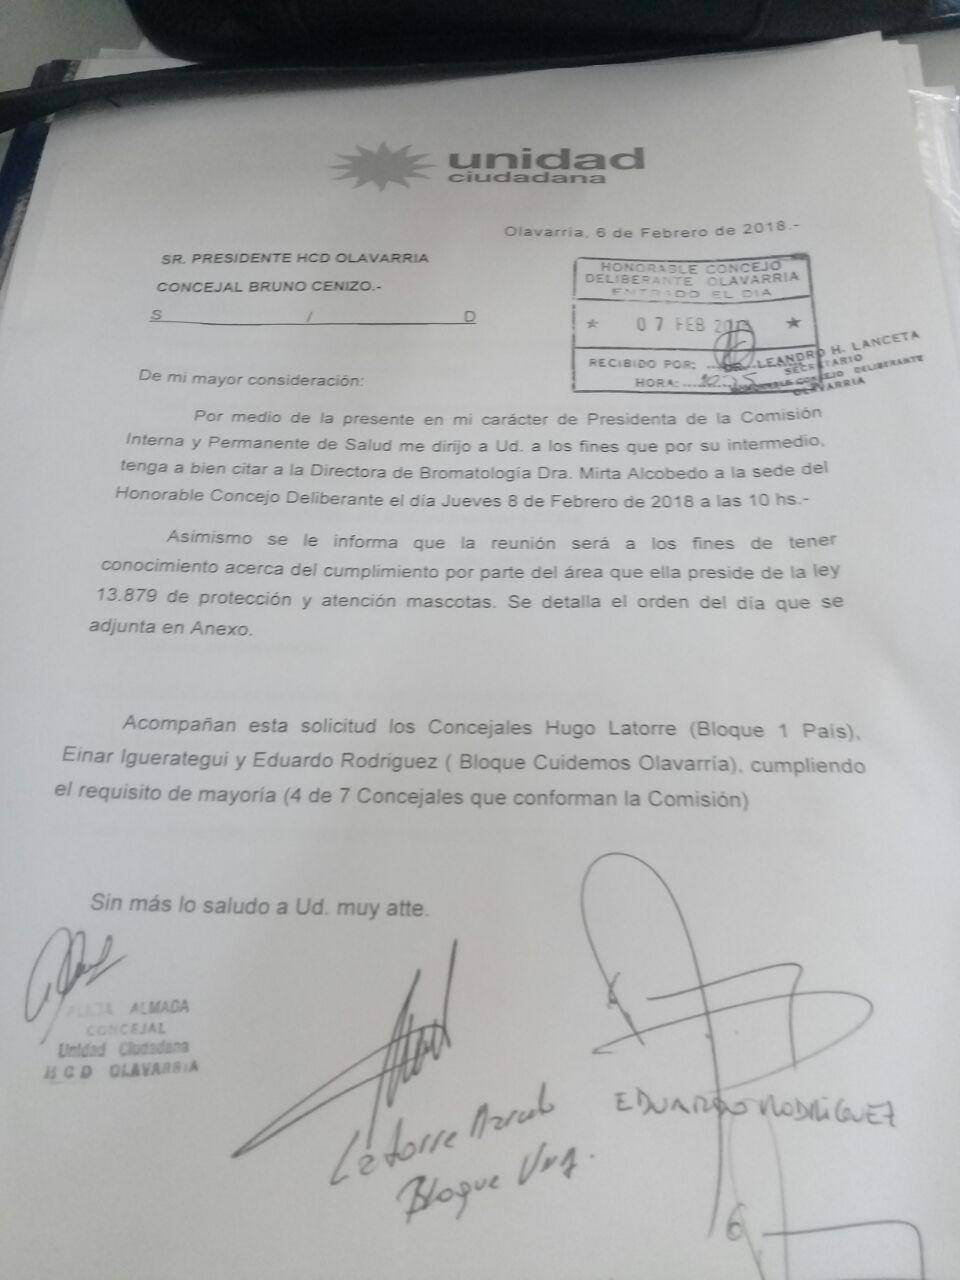 Oficializan la citación a Alcobedo